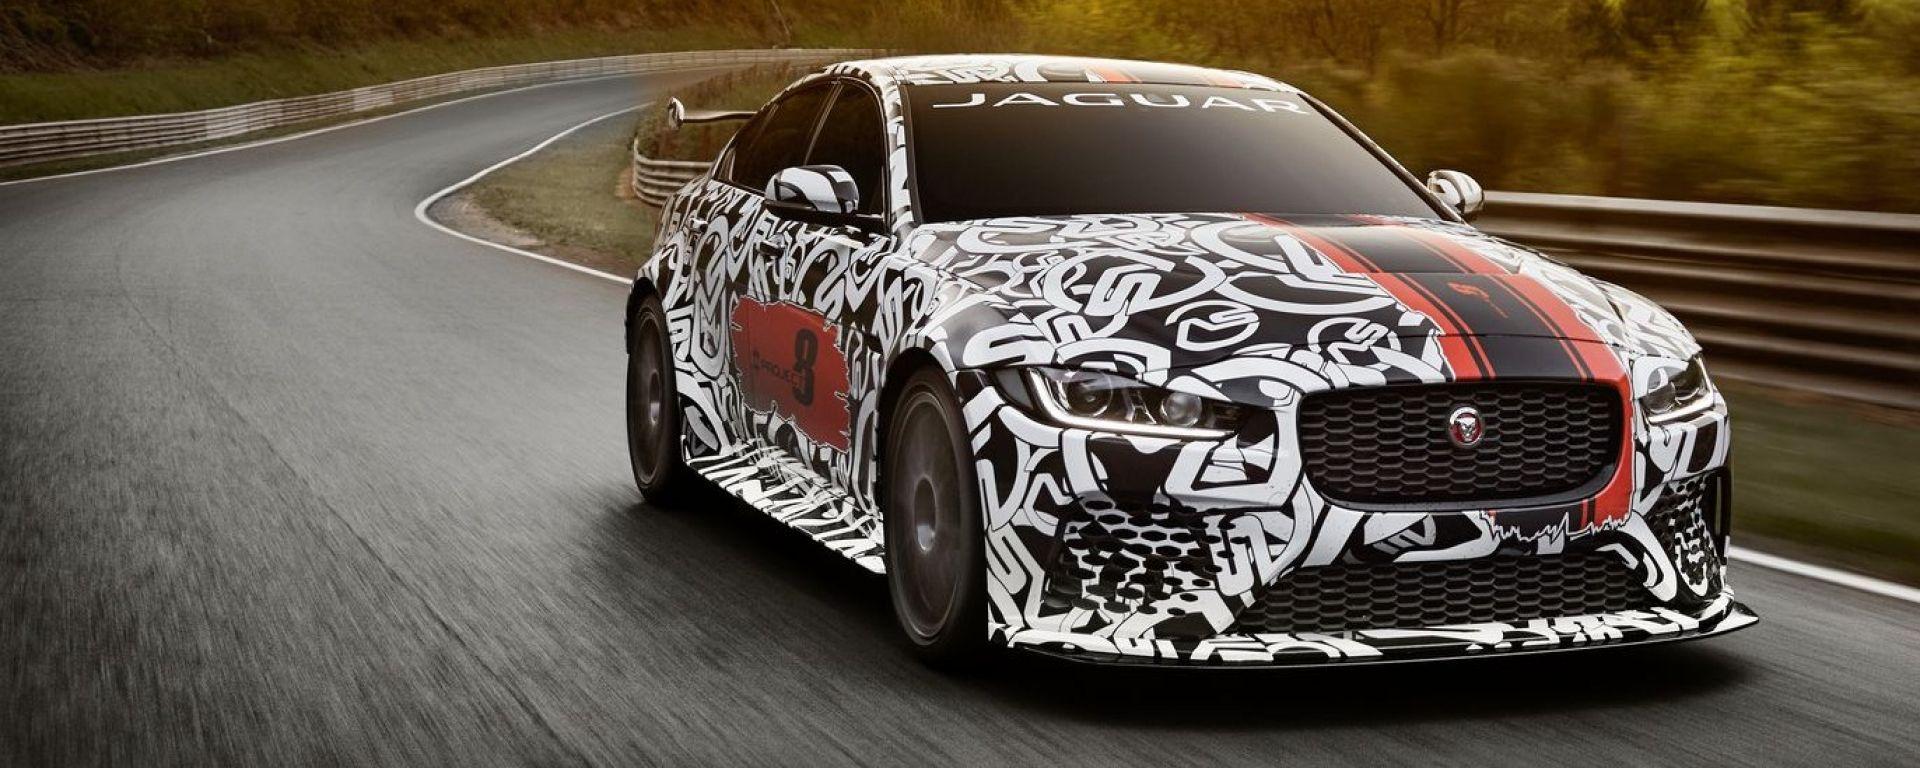 Jaguar XE SV Project 8, la Jaguar stradale più potente di sempre